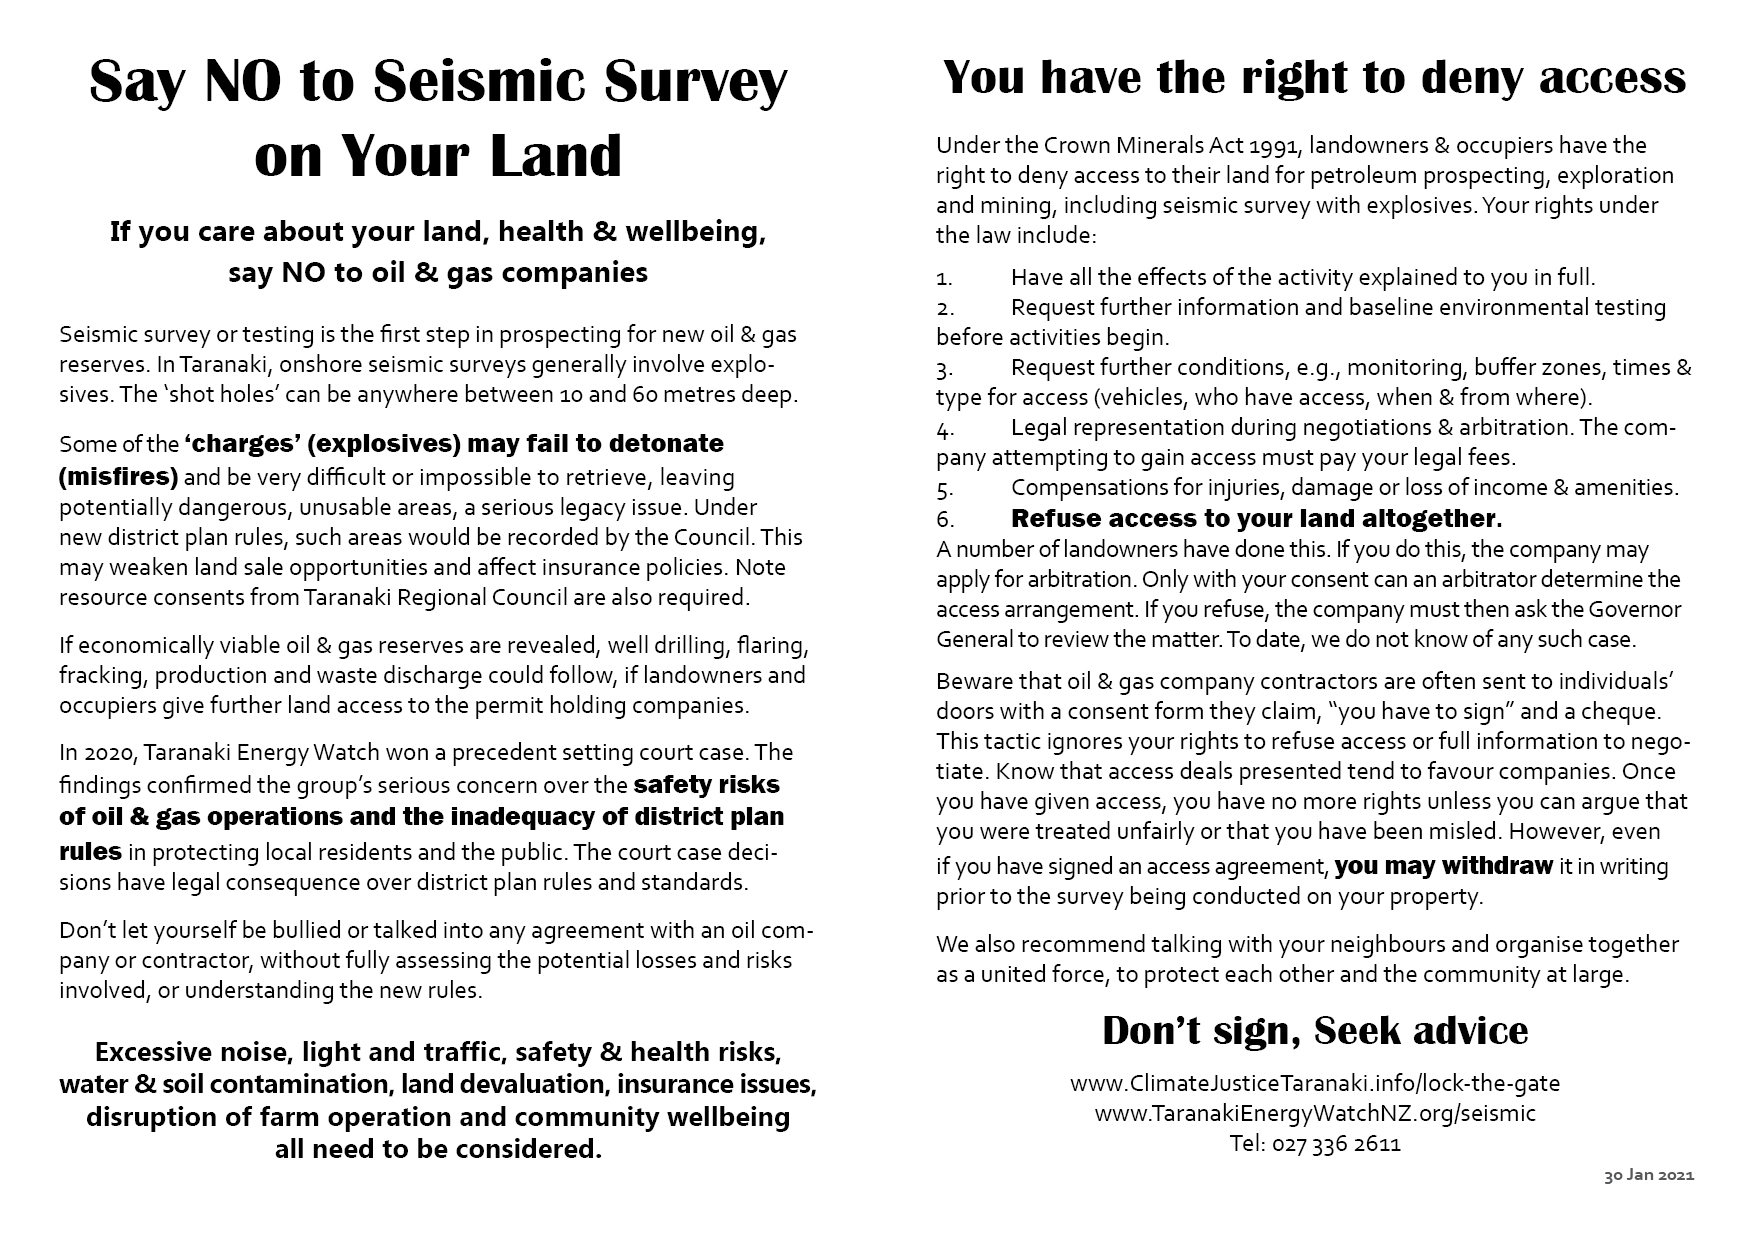 onshore-seismic-survey-leaflet-30jan21